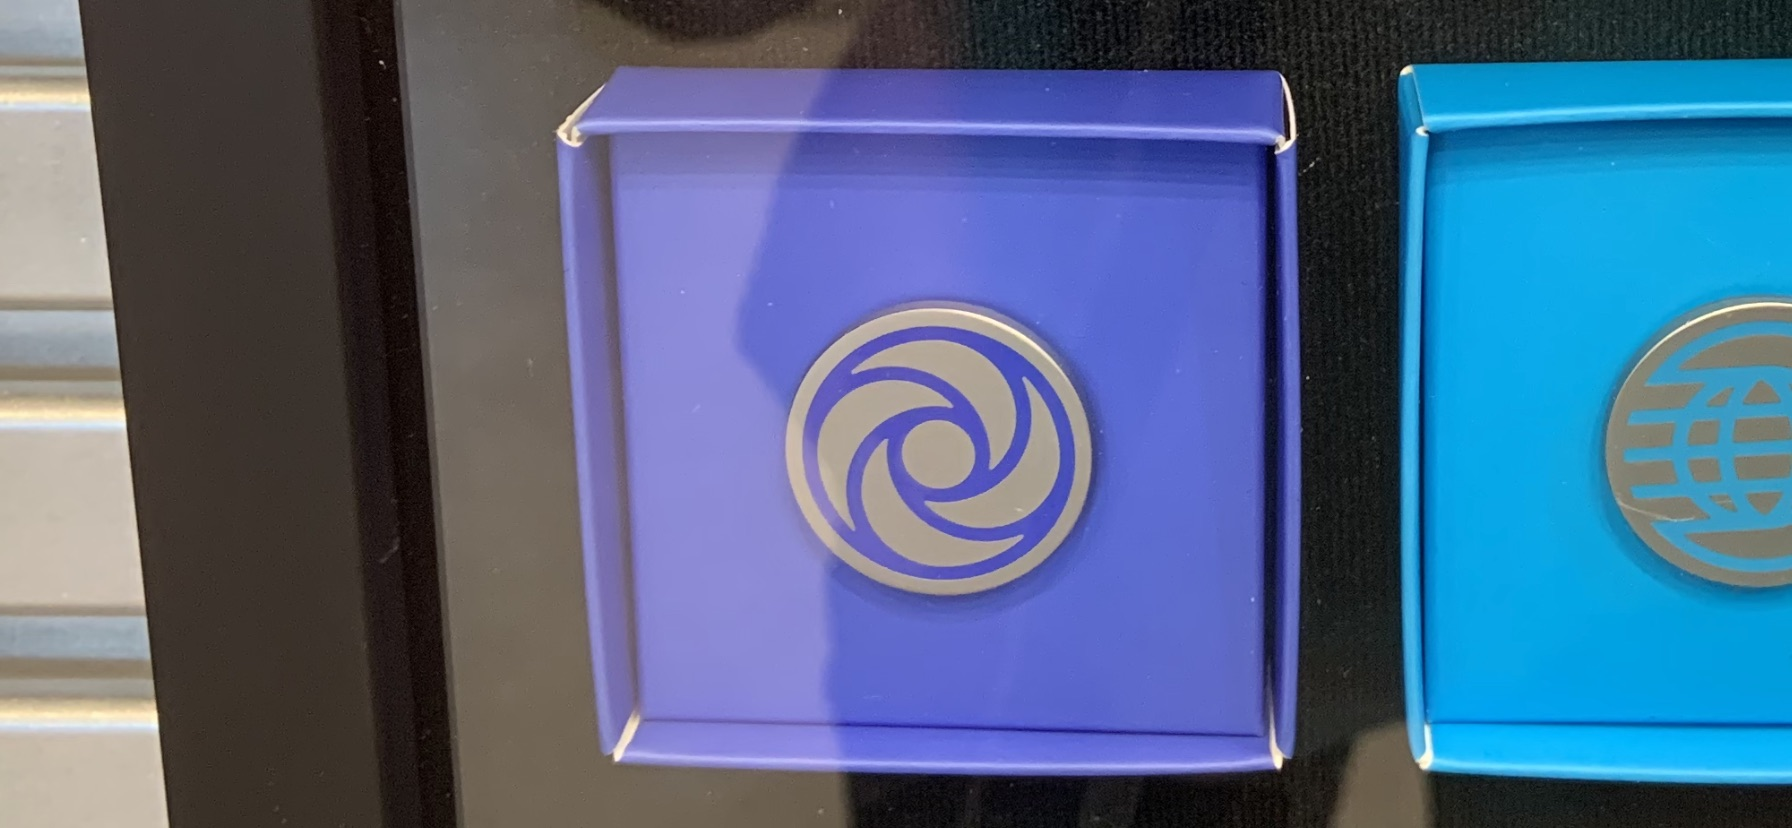 EPCOT pavilion logo pins 12/23/19 14